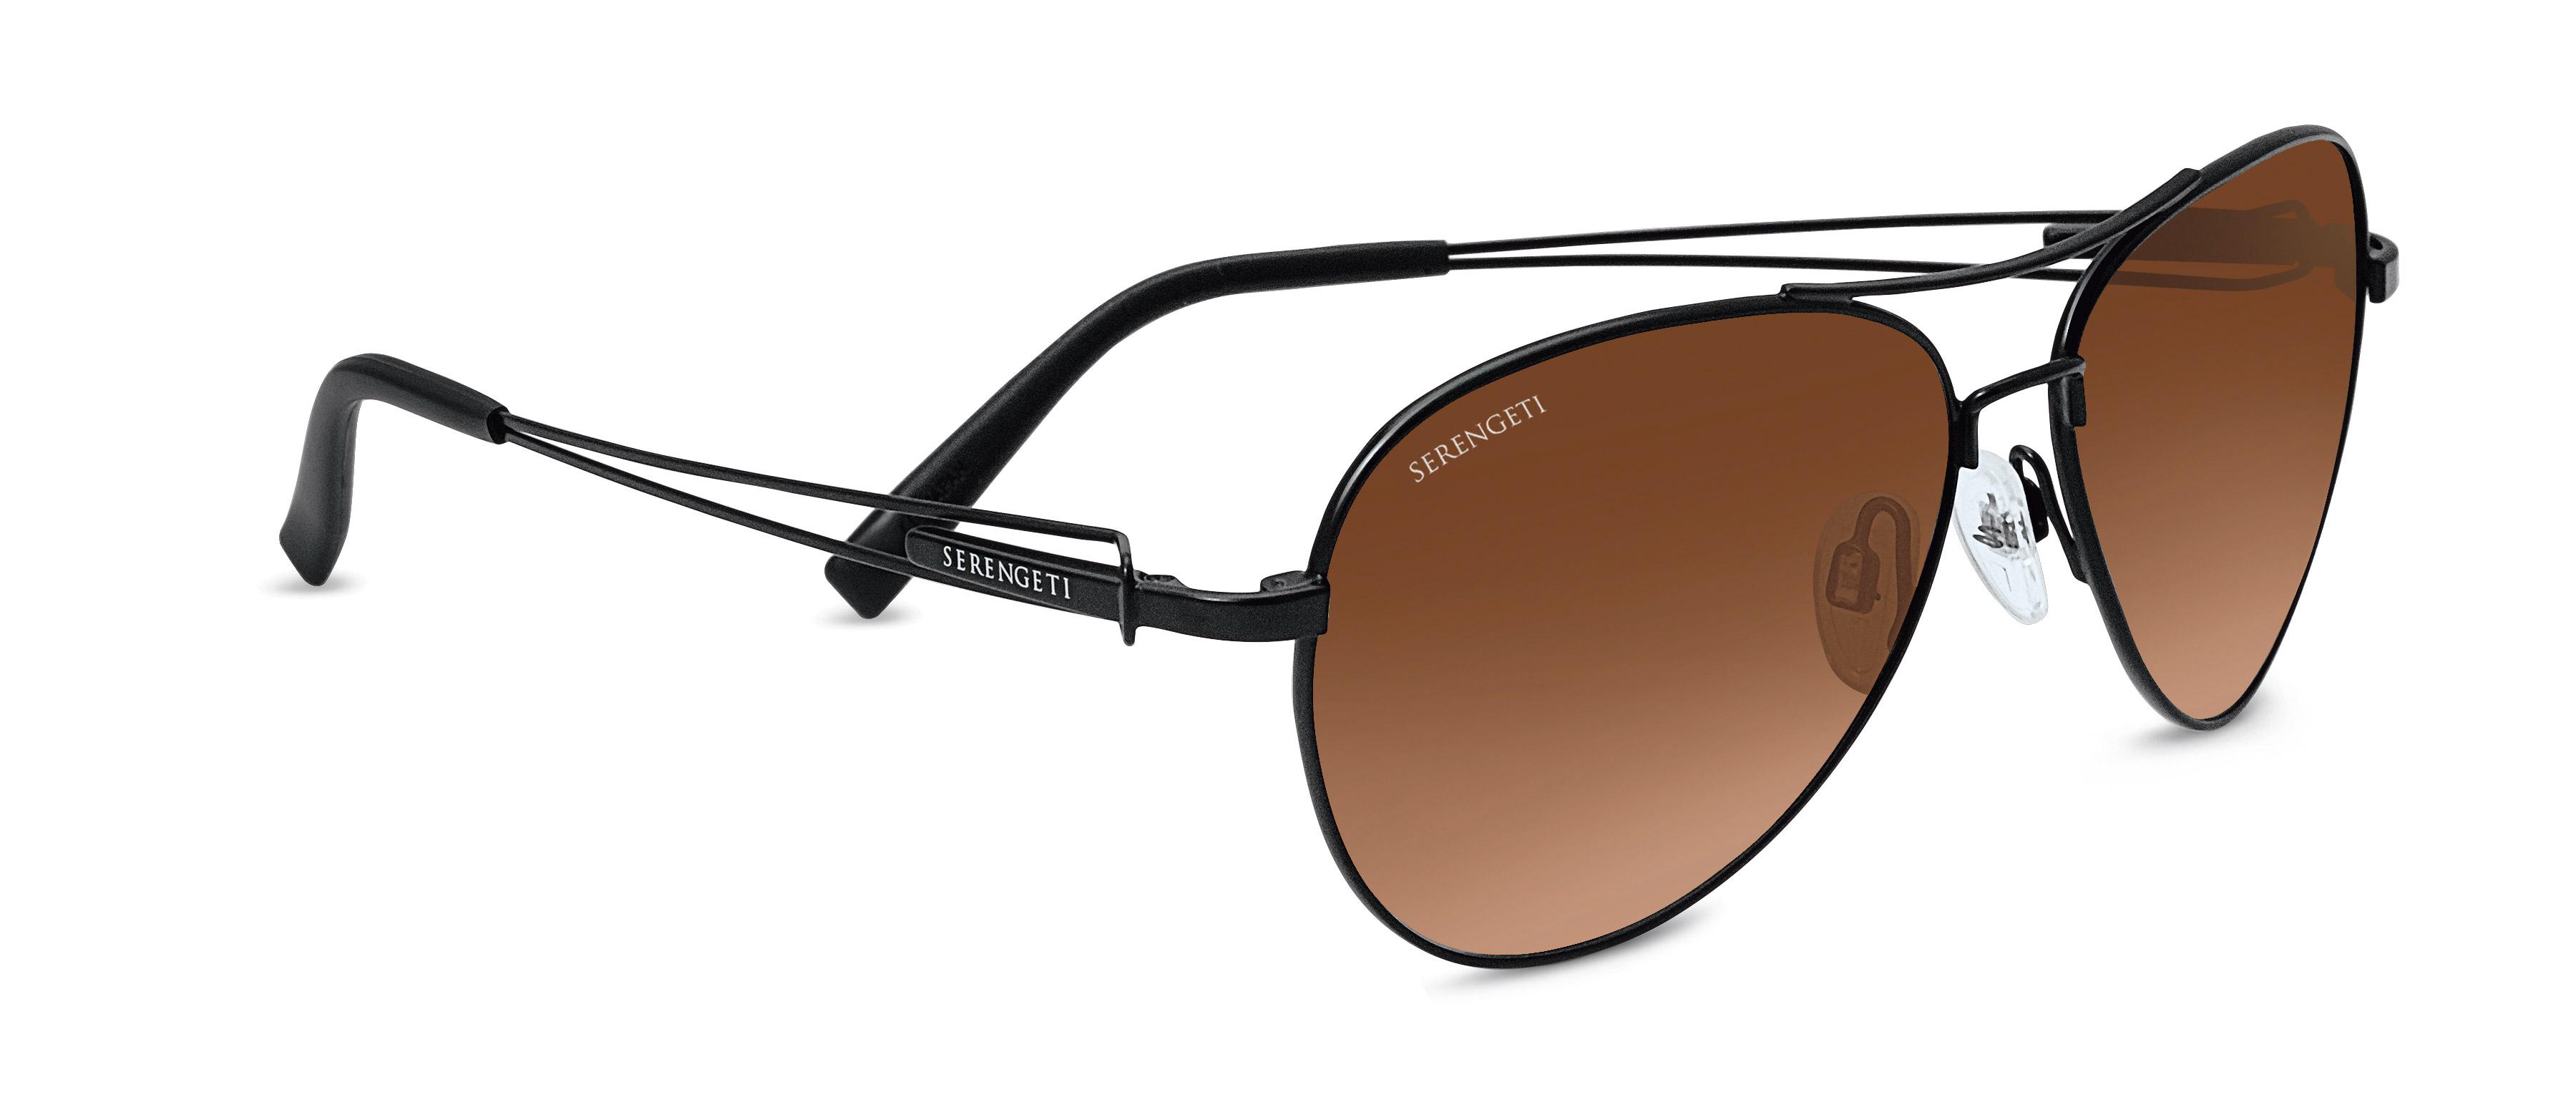 86d473b242a Serengeti Brando Sunglasses